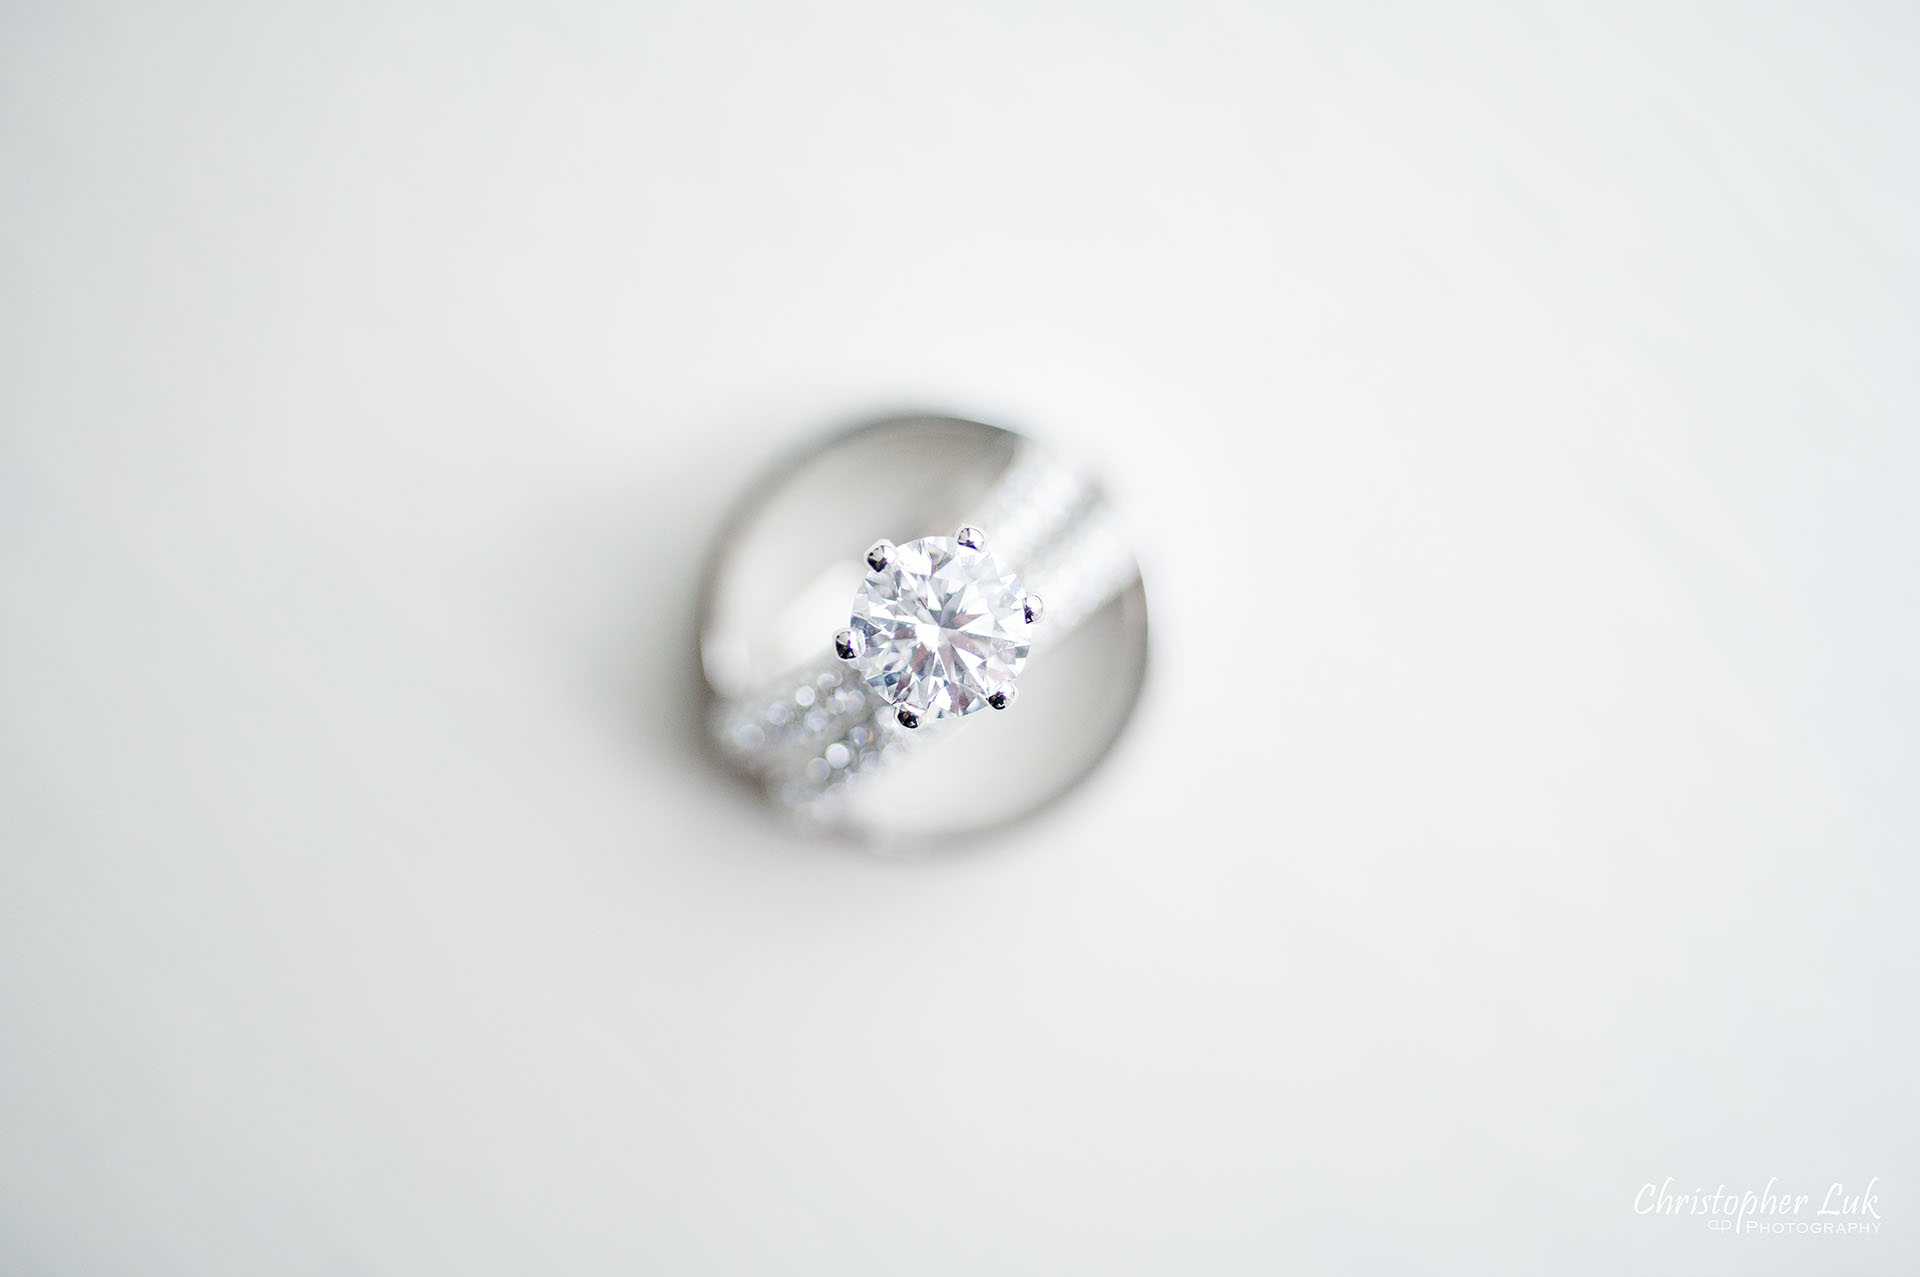 King Edward Hotel Crystal Ballroom Toronto Wedding Photographer MicroWedding Diamond Engagement Ring Gold Wedding Rings Bands